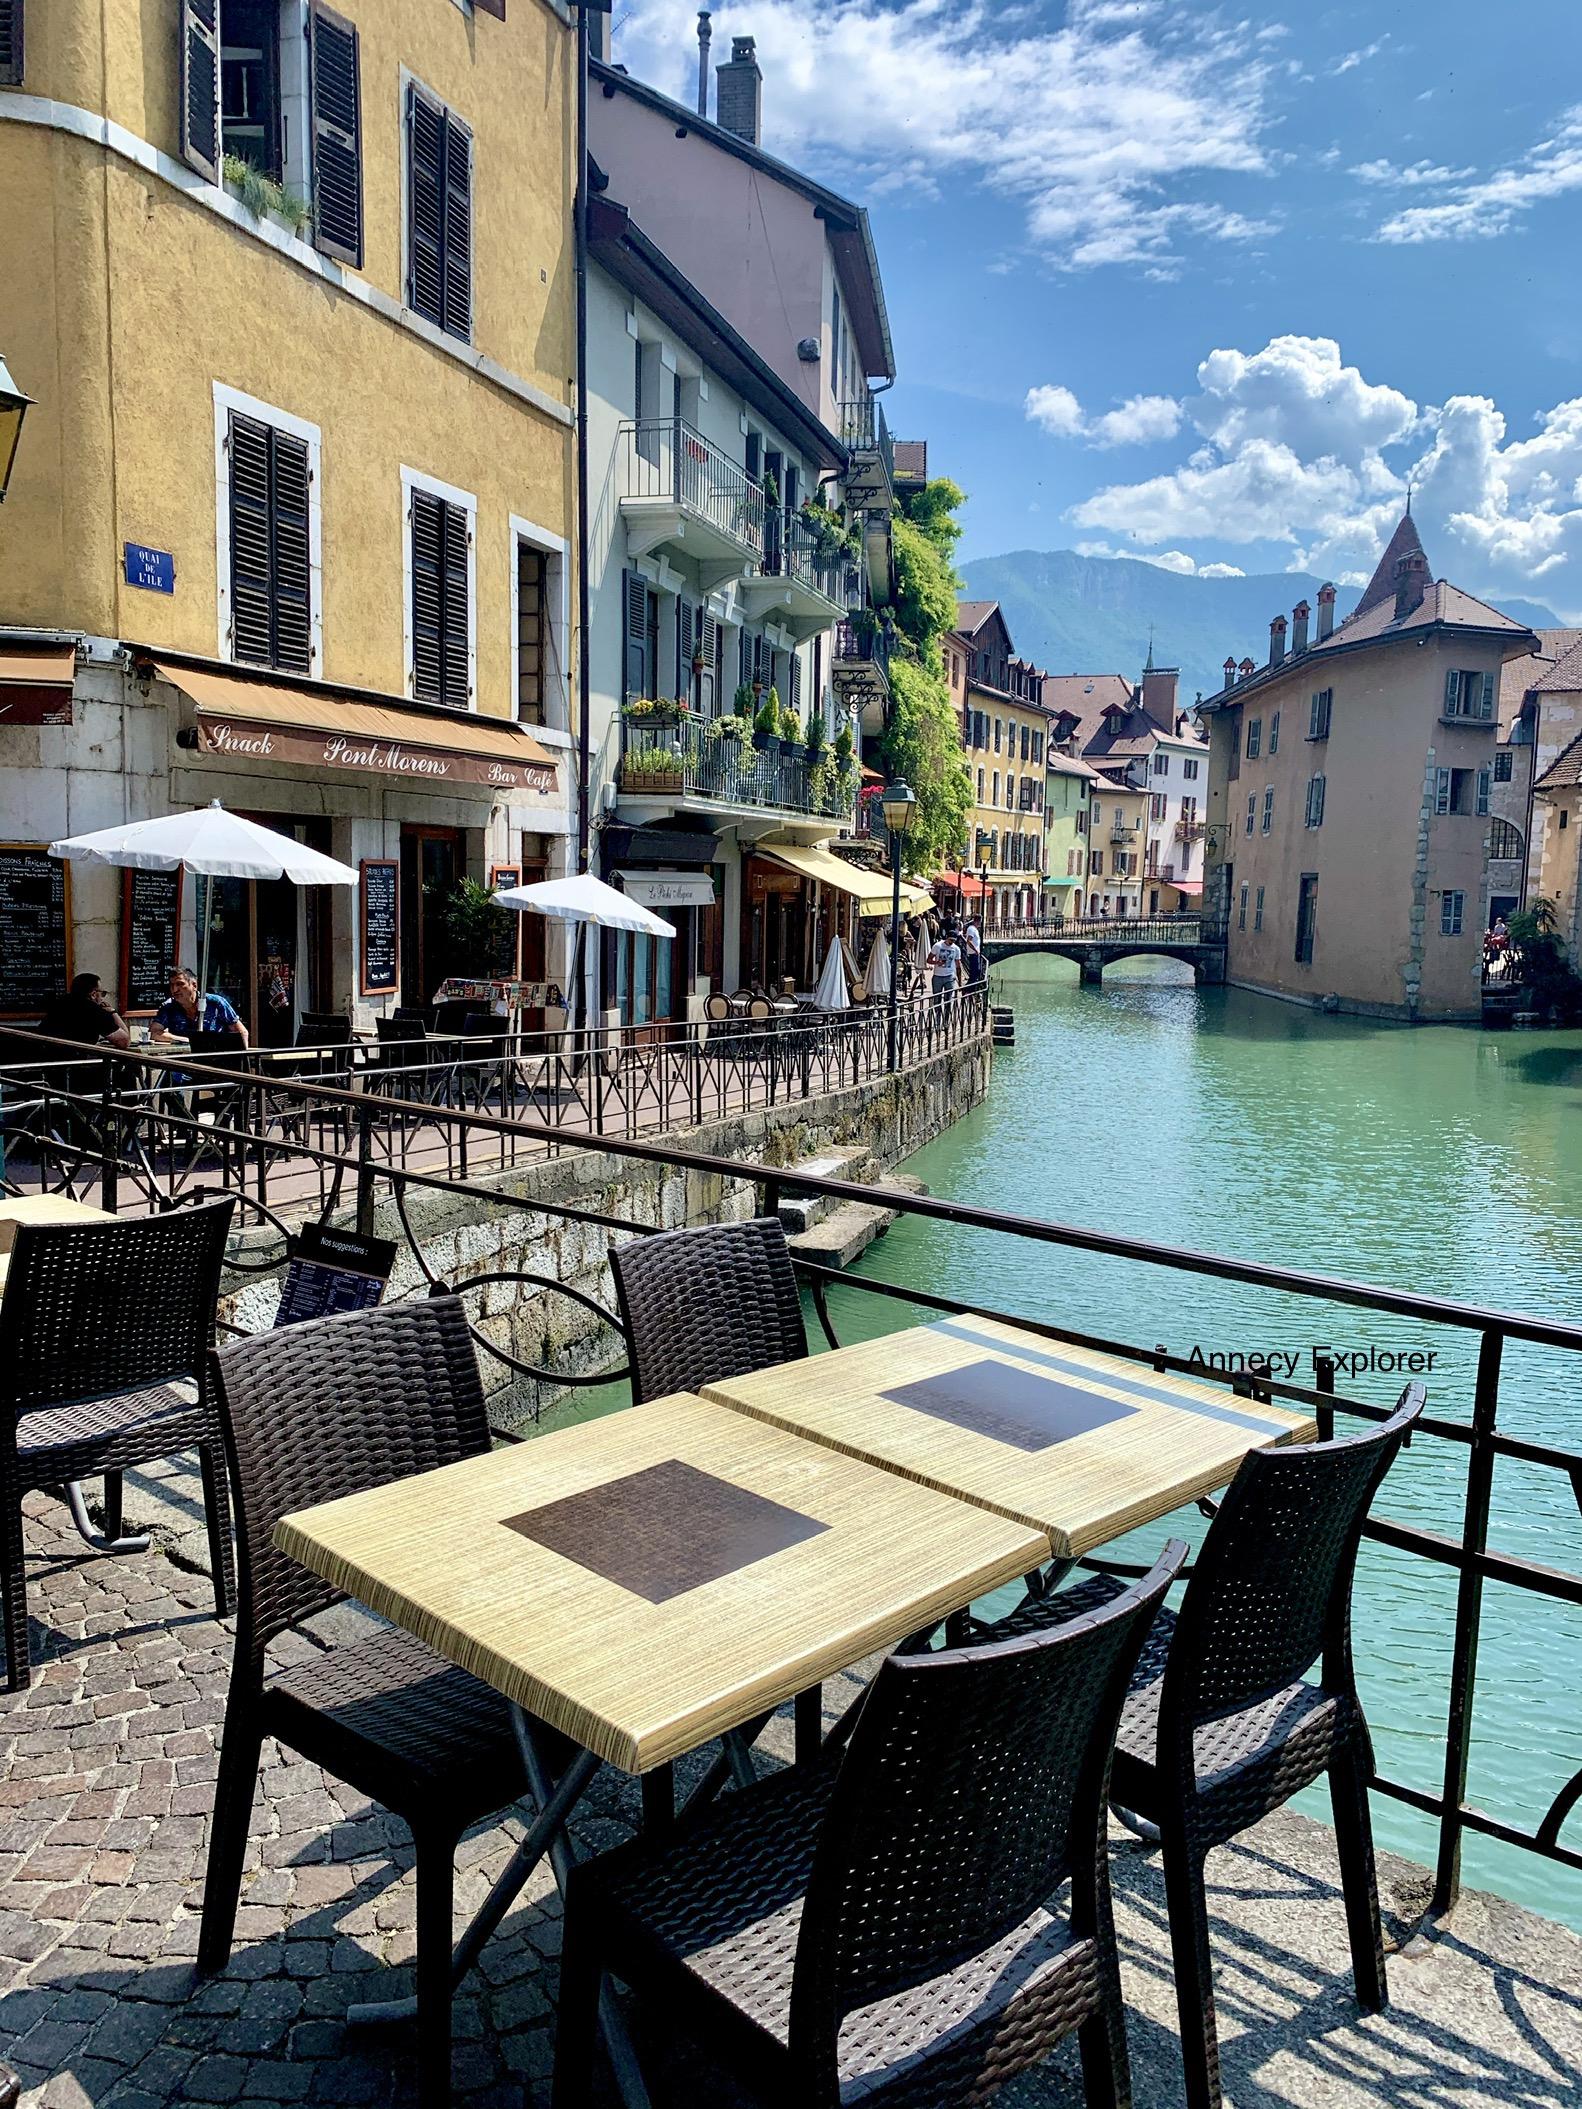 Où manger à Annecy?